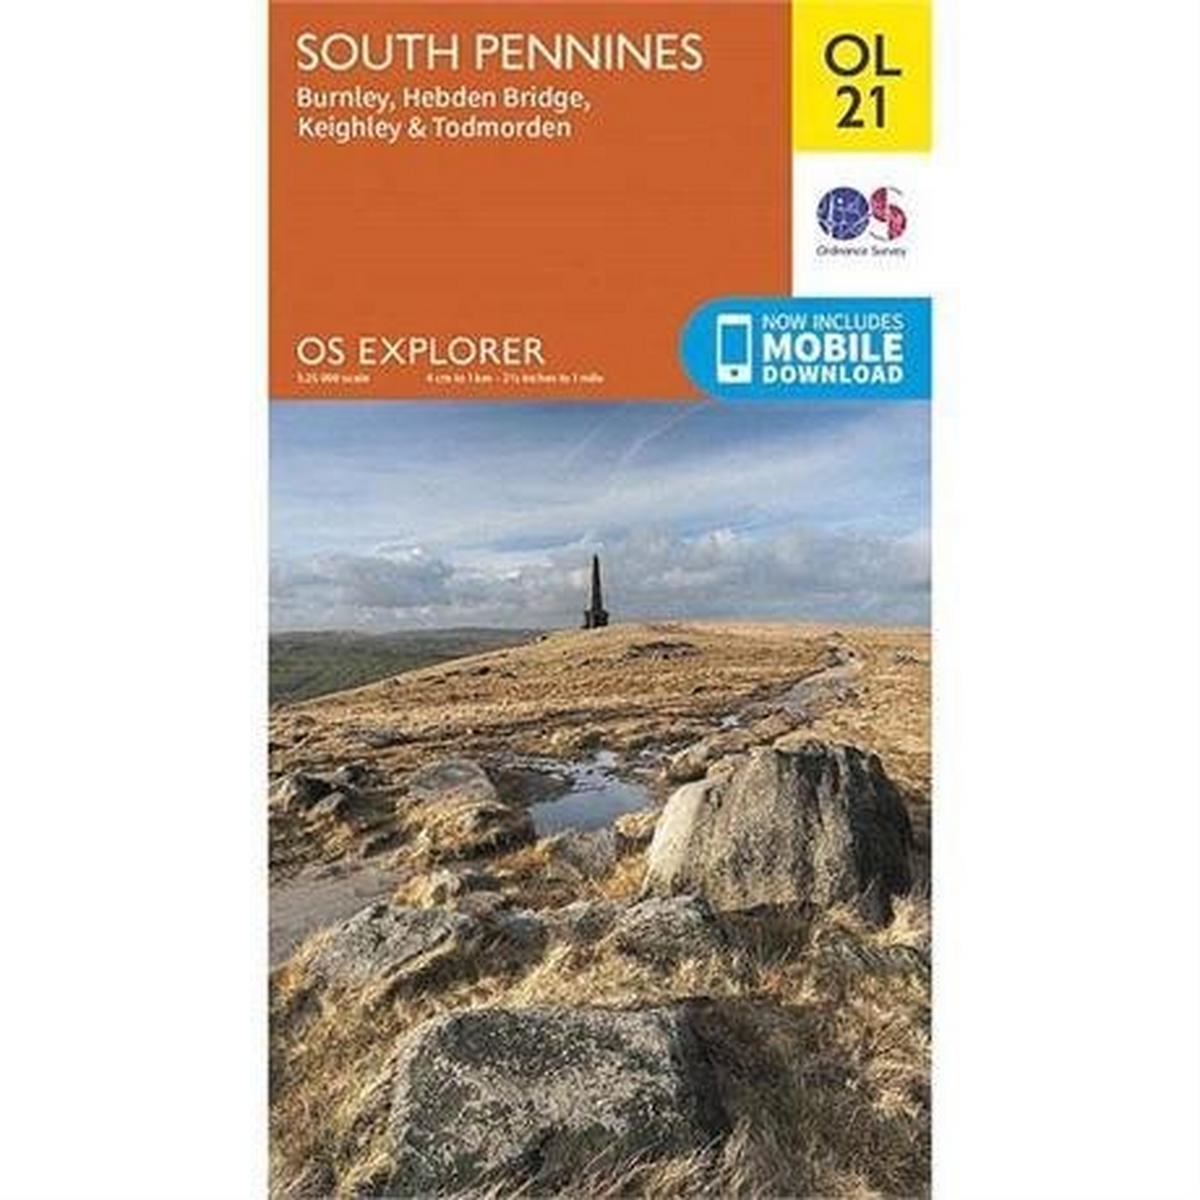 Ordnance Survey OS Explorer Map OL21 South Pennines